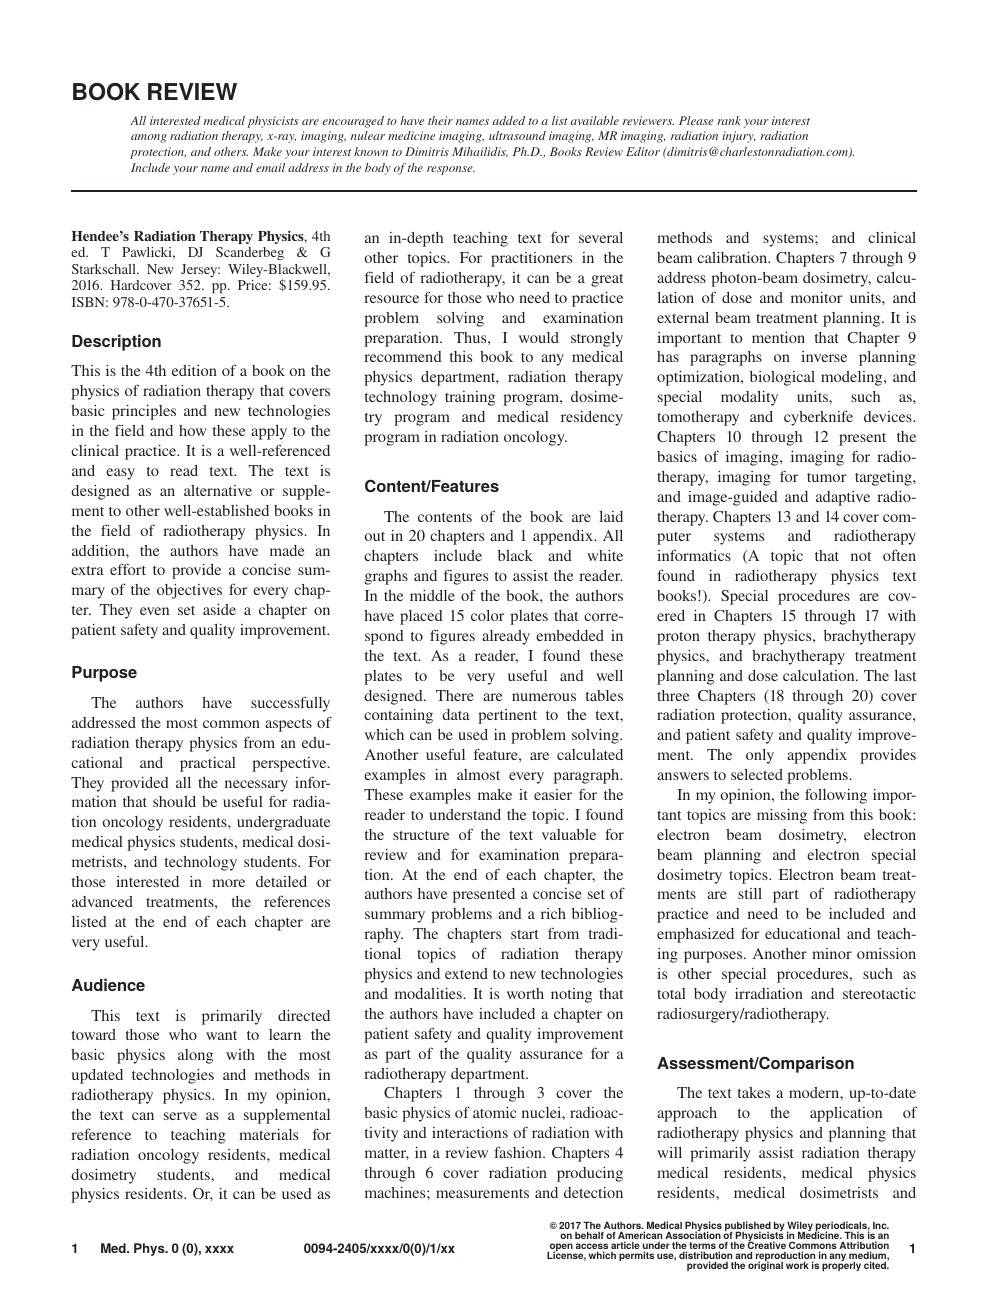 Hendee's Radiation Therapy Physics, 4th ed  TPawlicki, DJScanderbeg